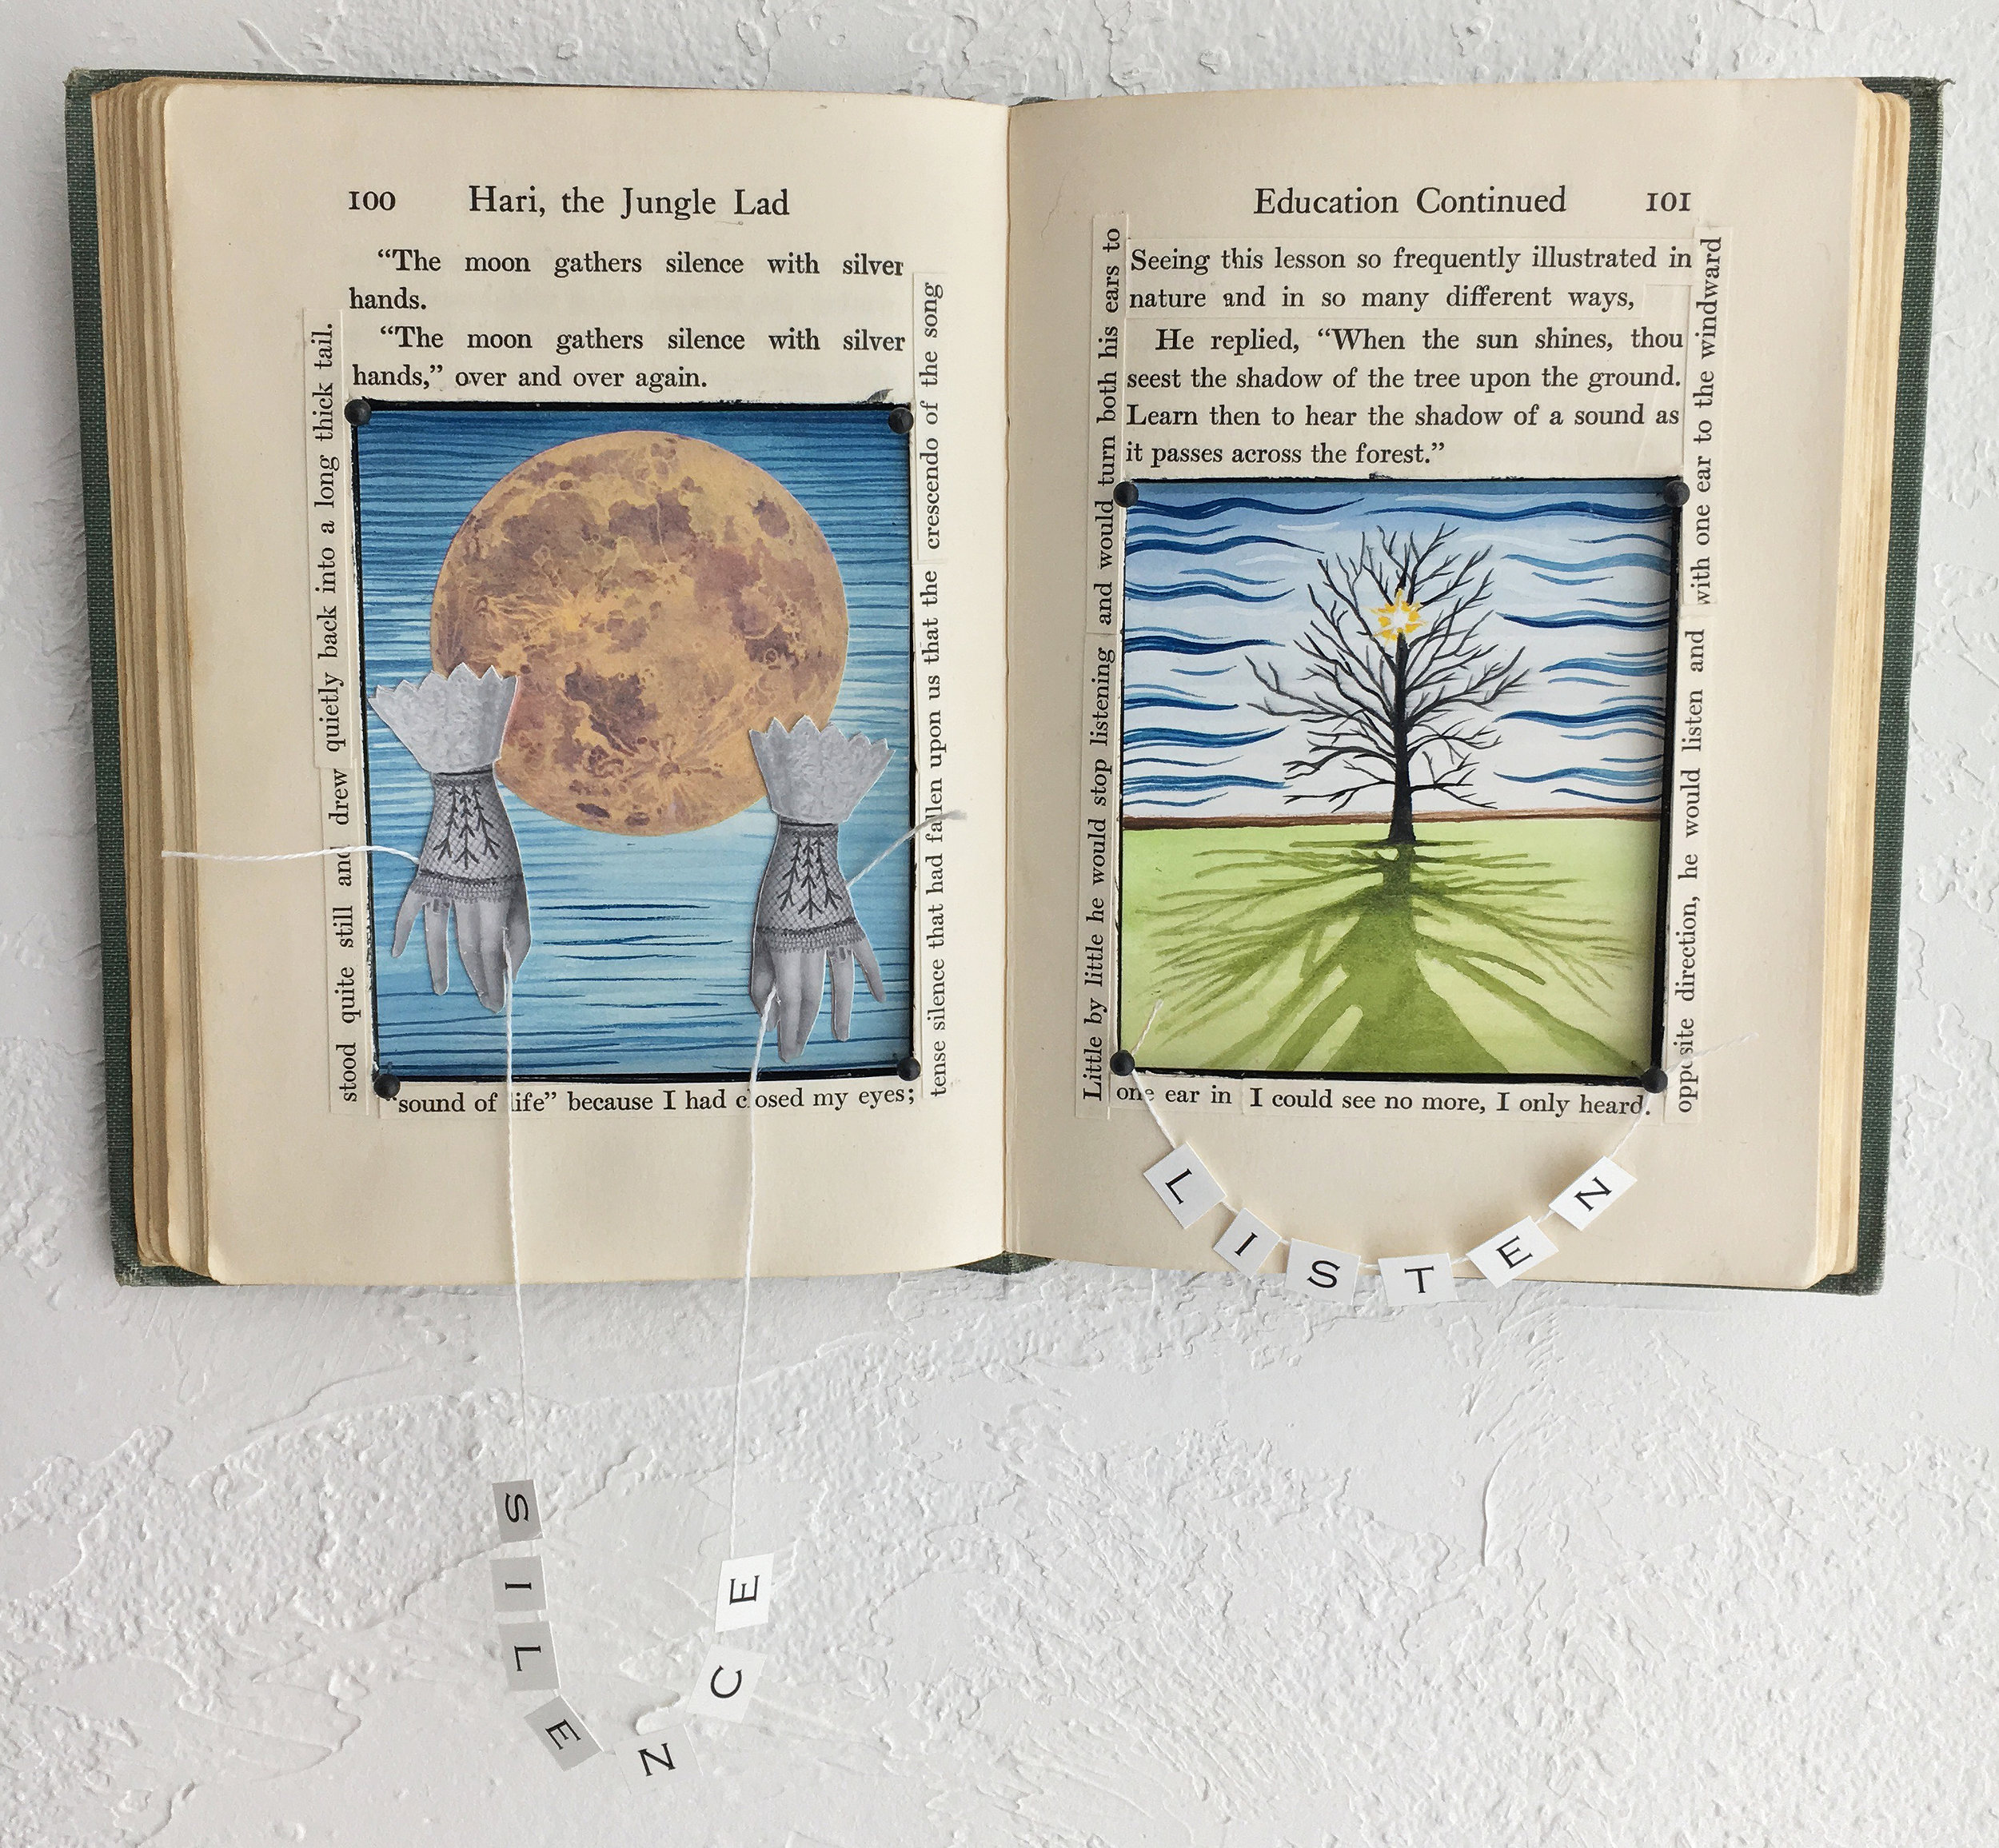 Hari Book Art By Patrushka cropped.jpg